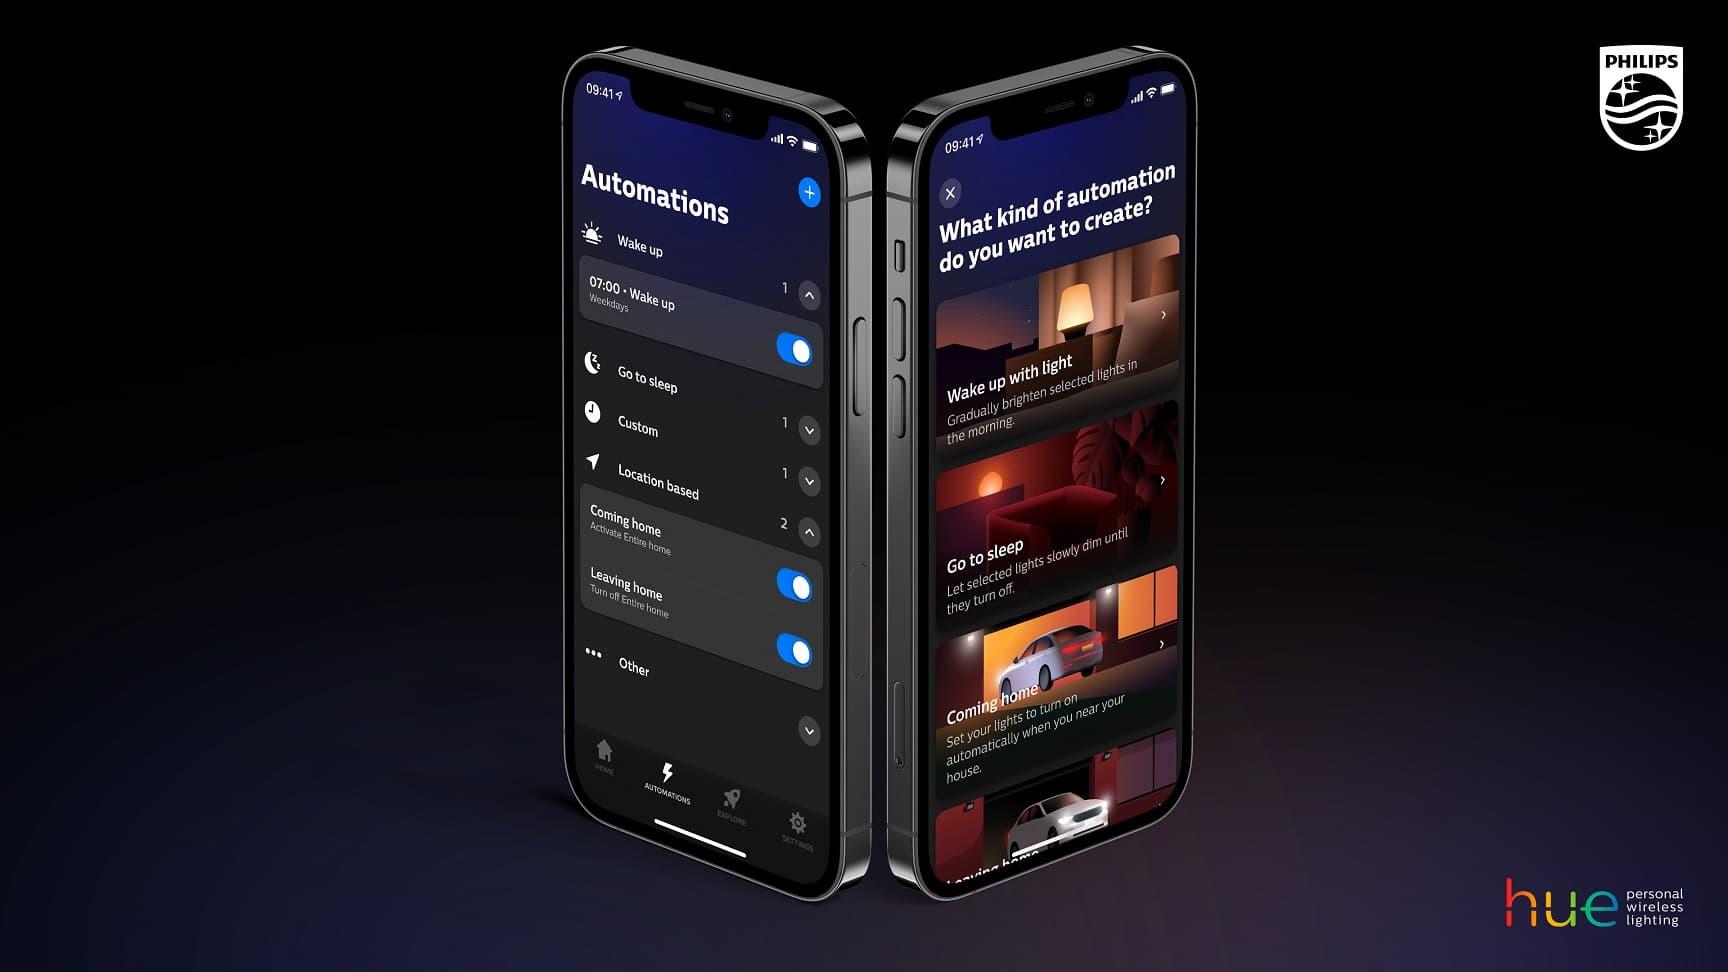 aplikacja Philips Hue 4.0